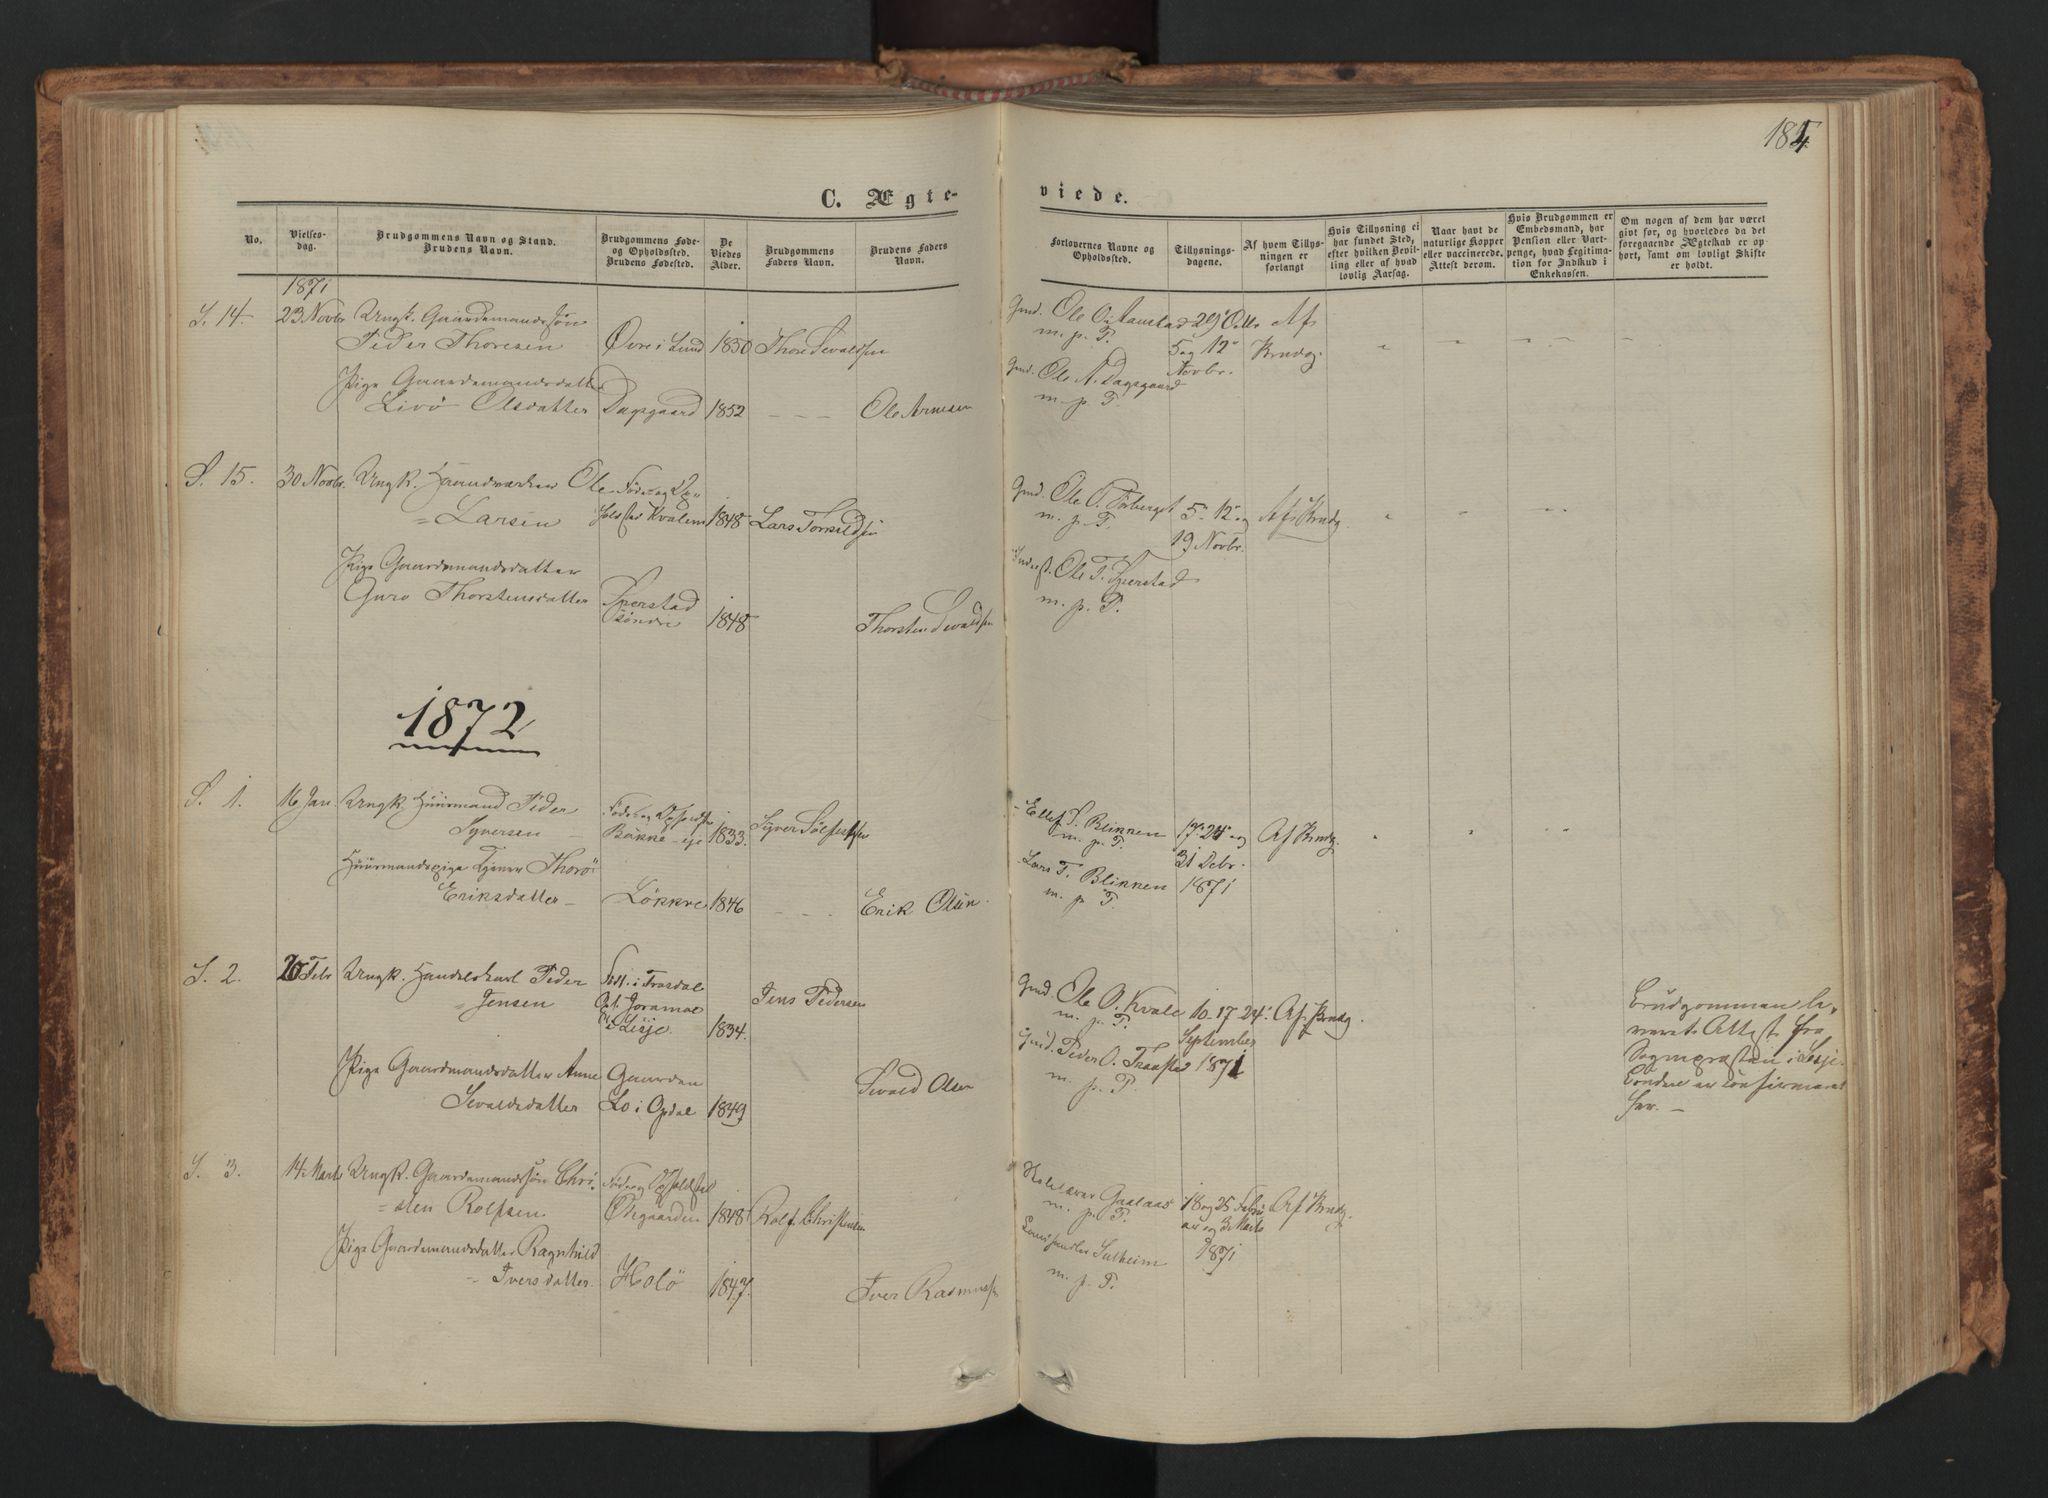 SAH, Skjåk prestekontor, Ministerialbok nr. 1, 1863-1879, s. 184